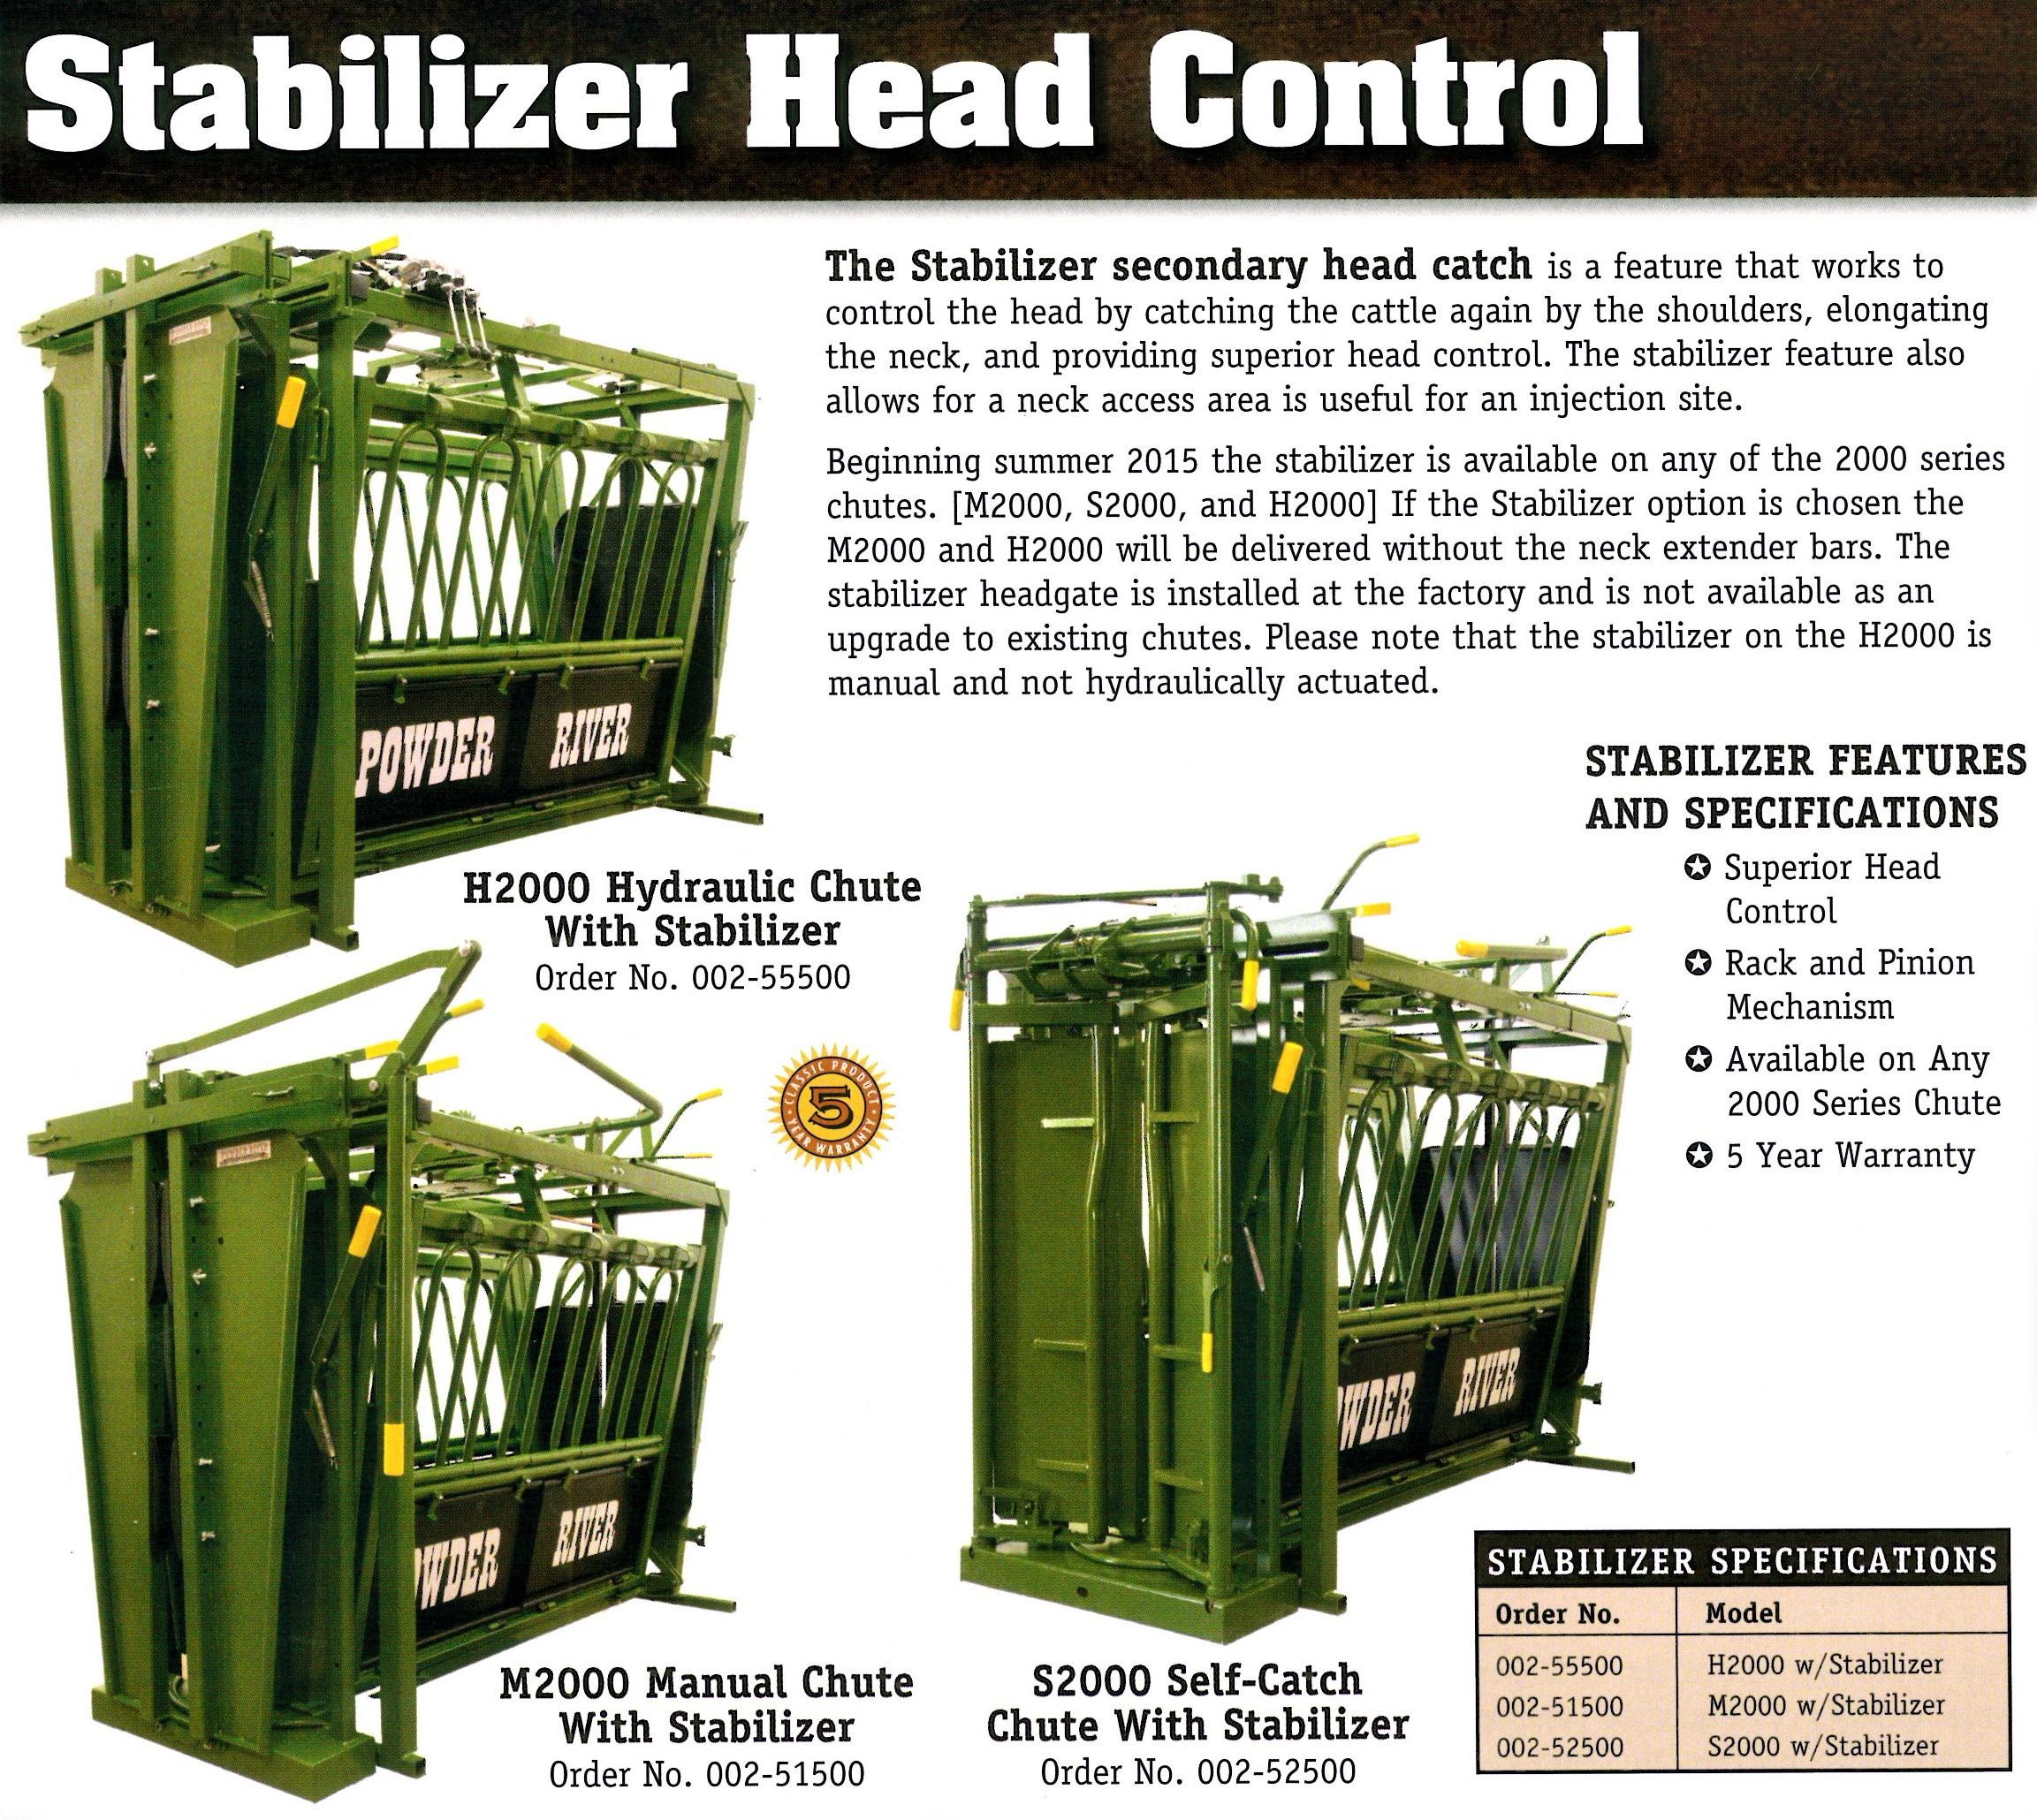 august-2020-powder-river-stabilizer-head-control-with-chutes.jpg